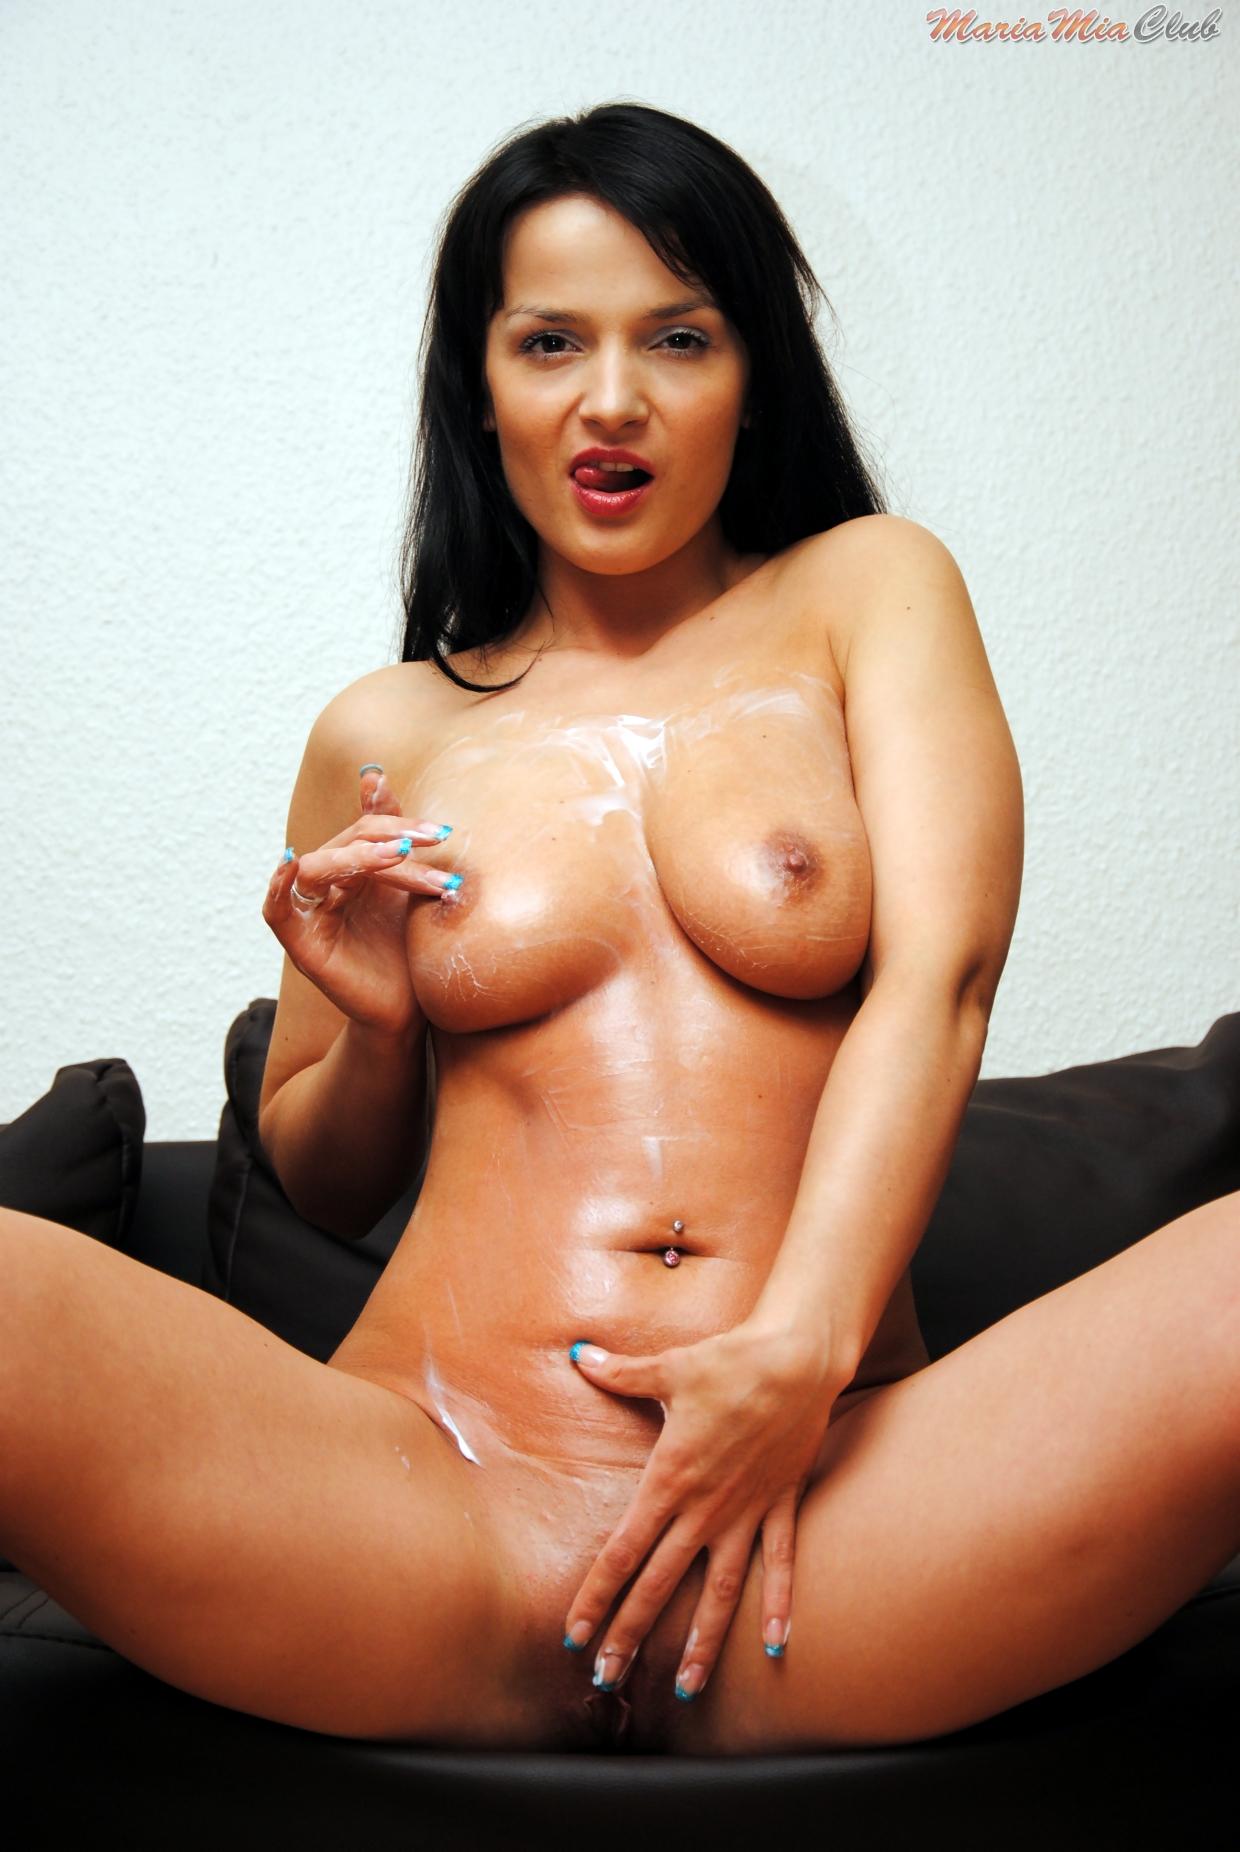 Lisa cross tits flex porn tube